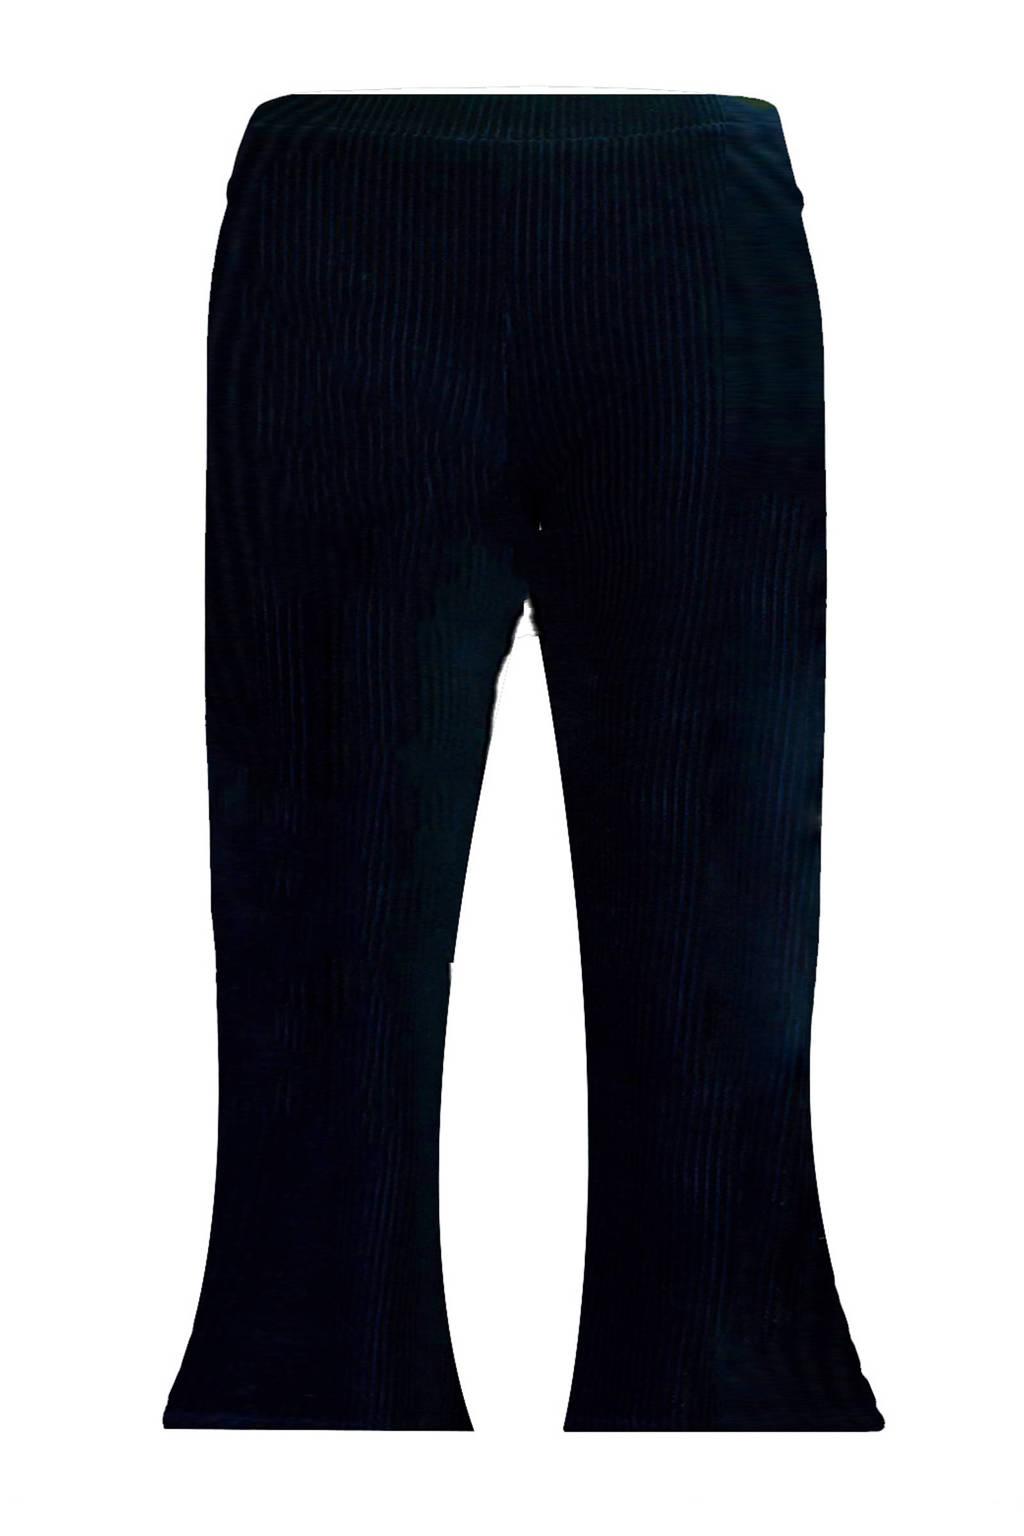 Beebielove corduroy flared broek donkerblauw, Donkerblauw